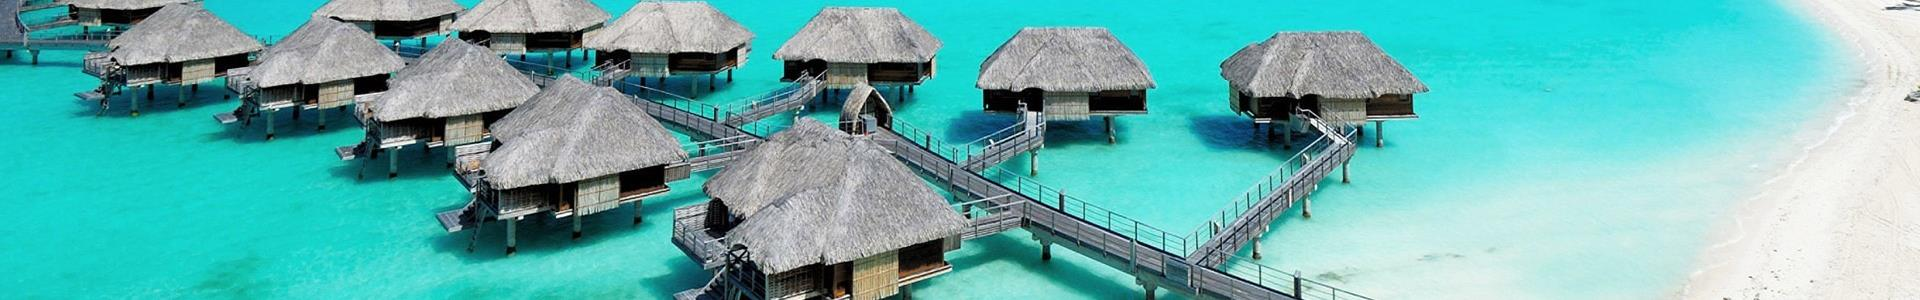 WordPress Themes for Hotels, Resorts, & Accommodations